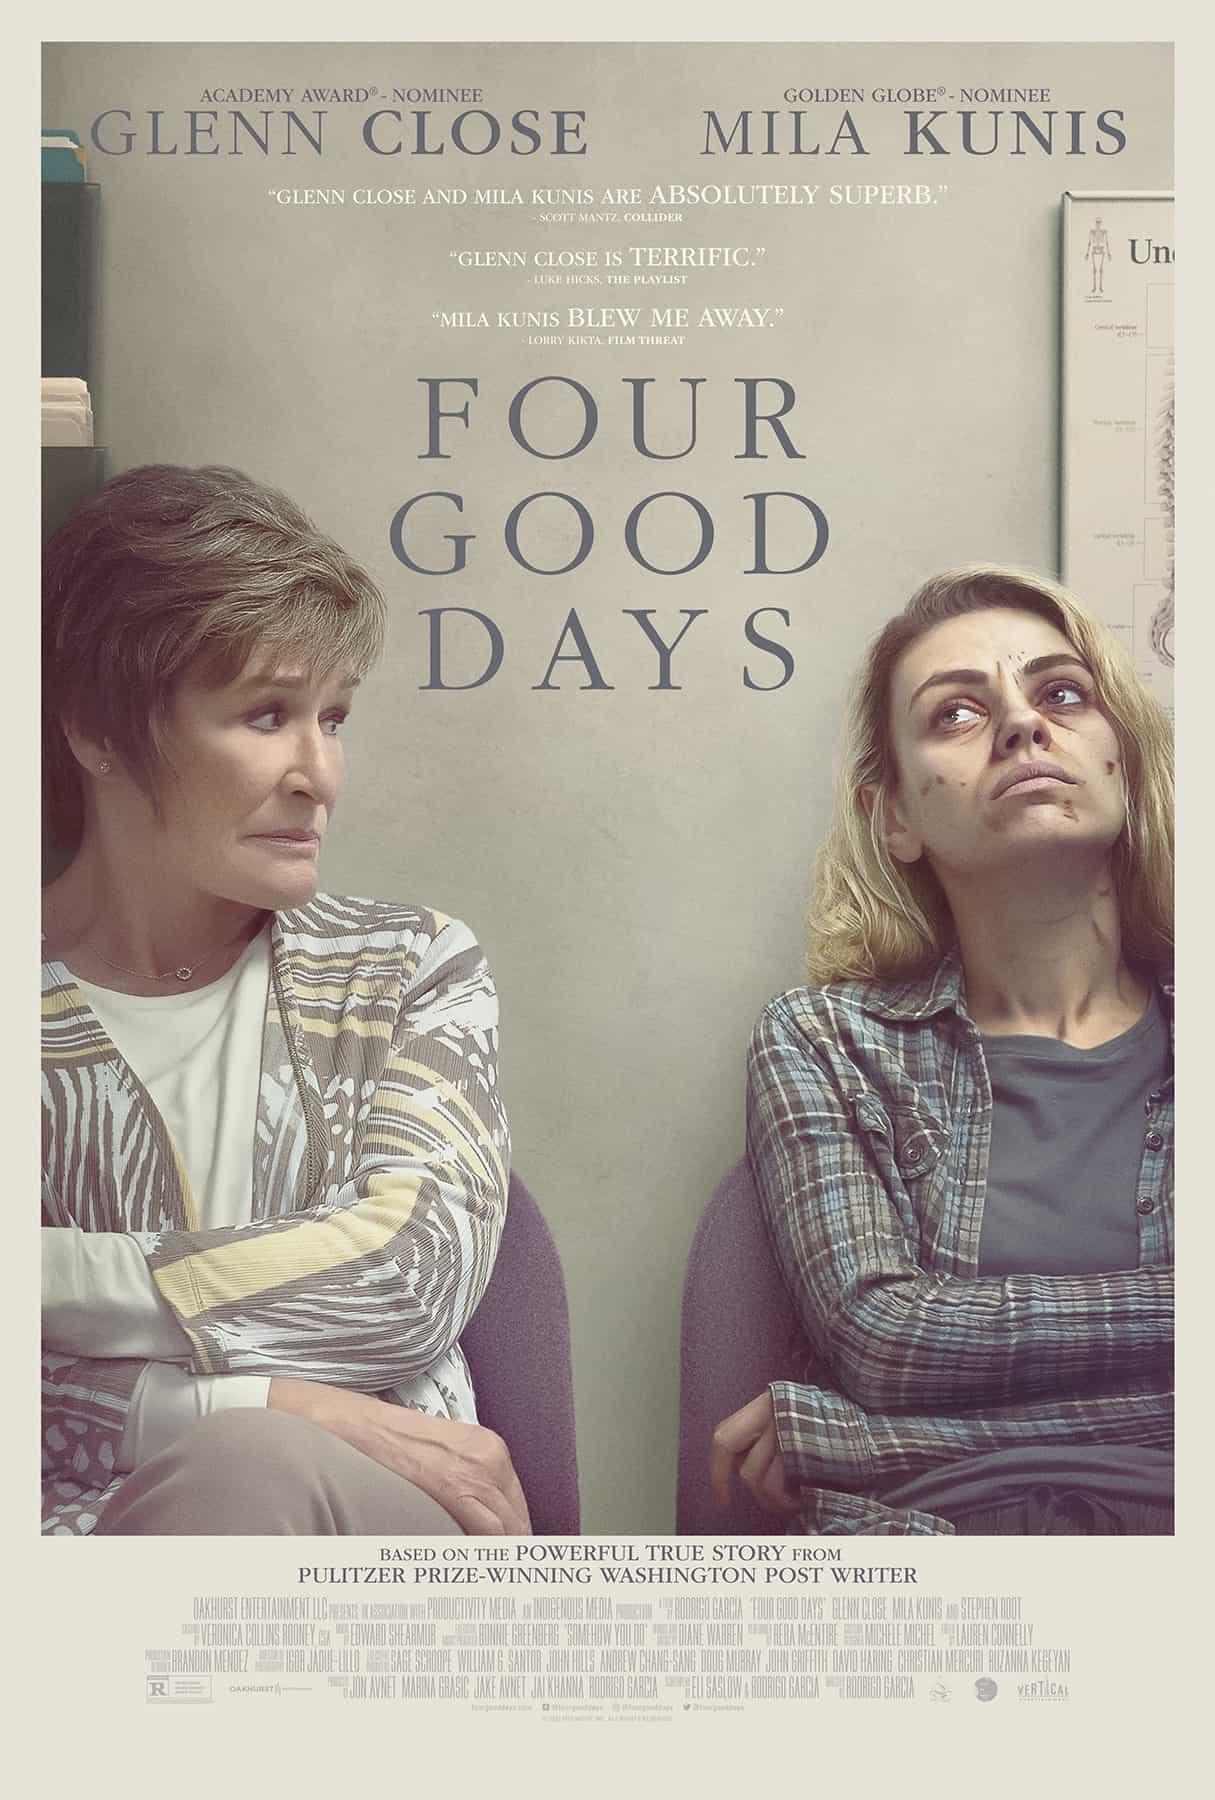 Jon Hamm Podcasts, Lesbian Slasher Movies, Four Good Days [4/2021 Movie News] 8